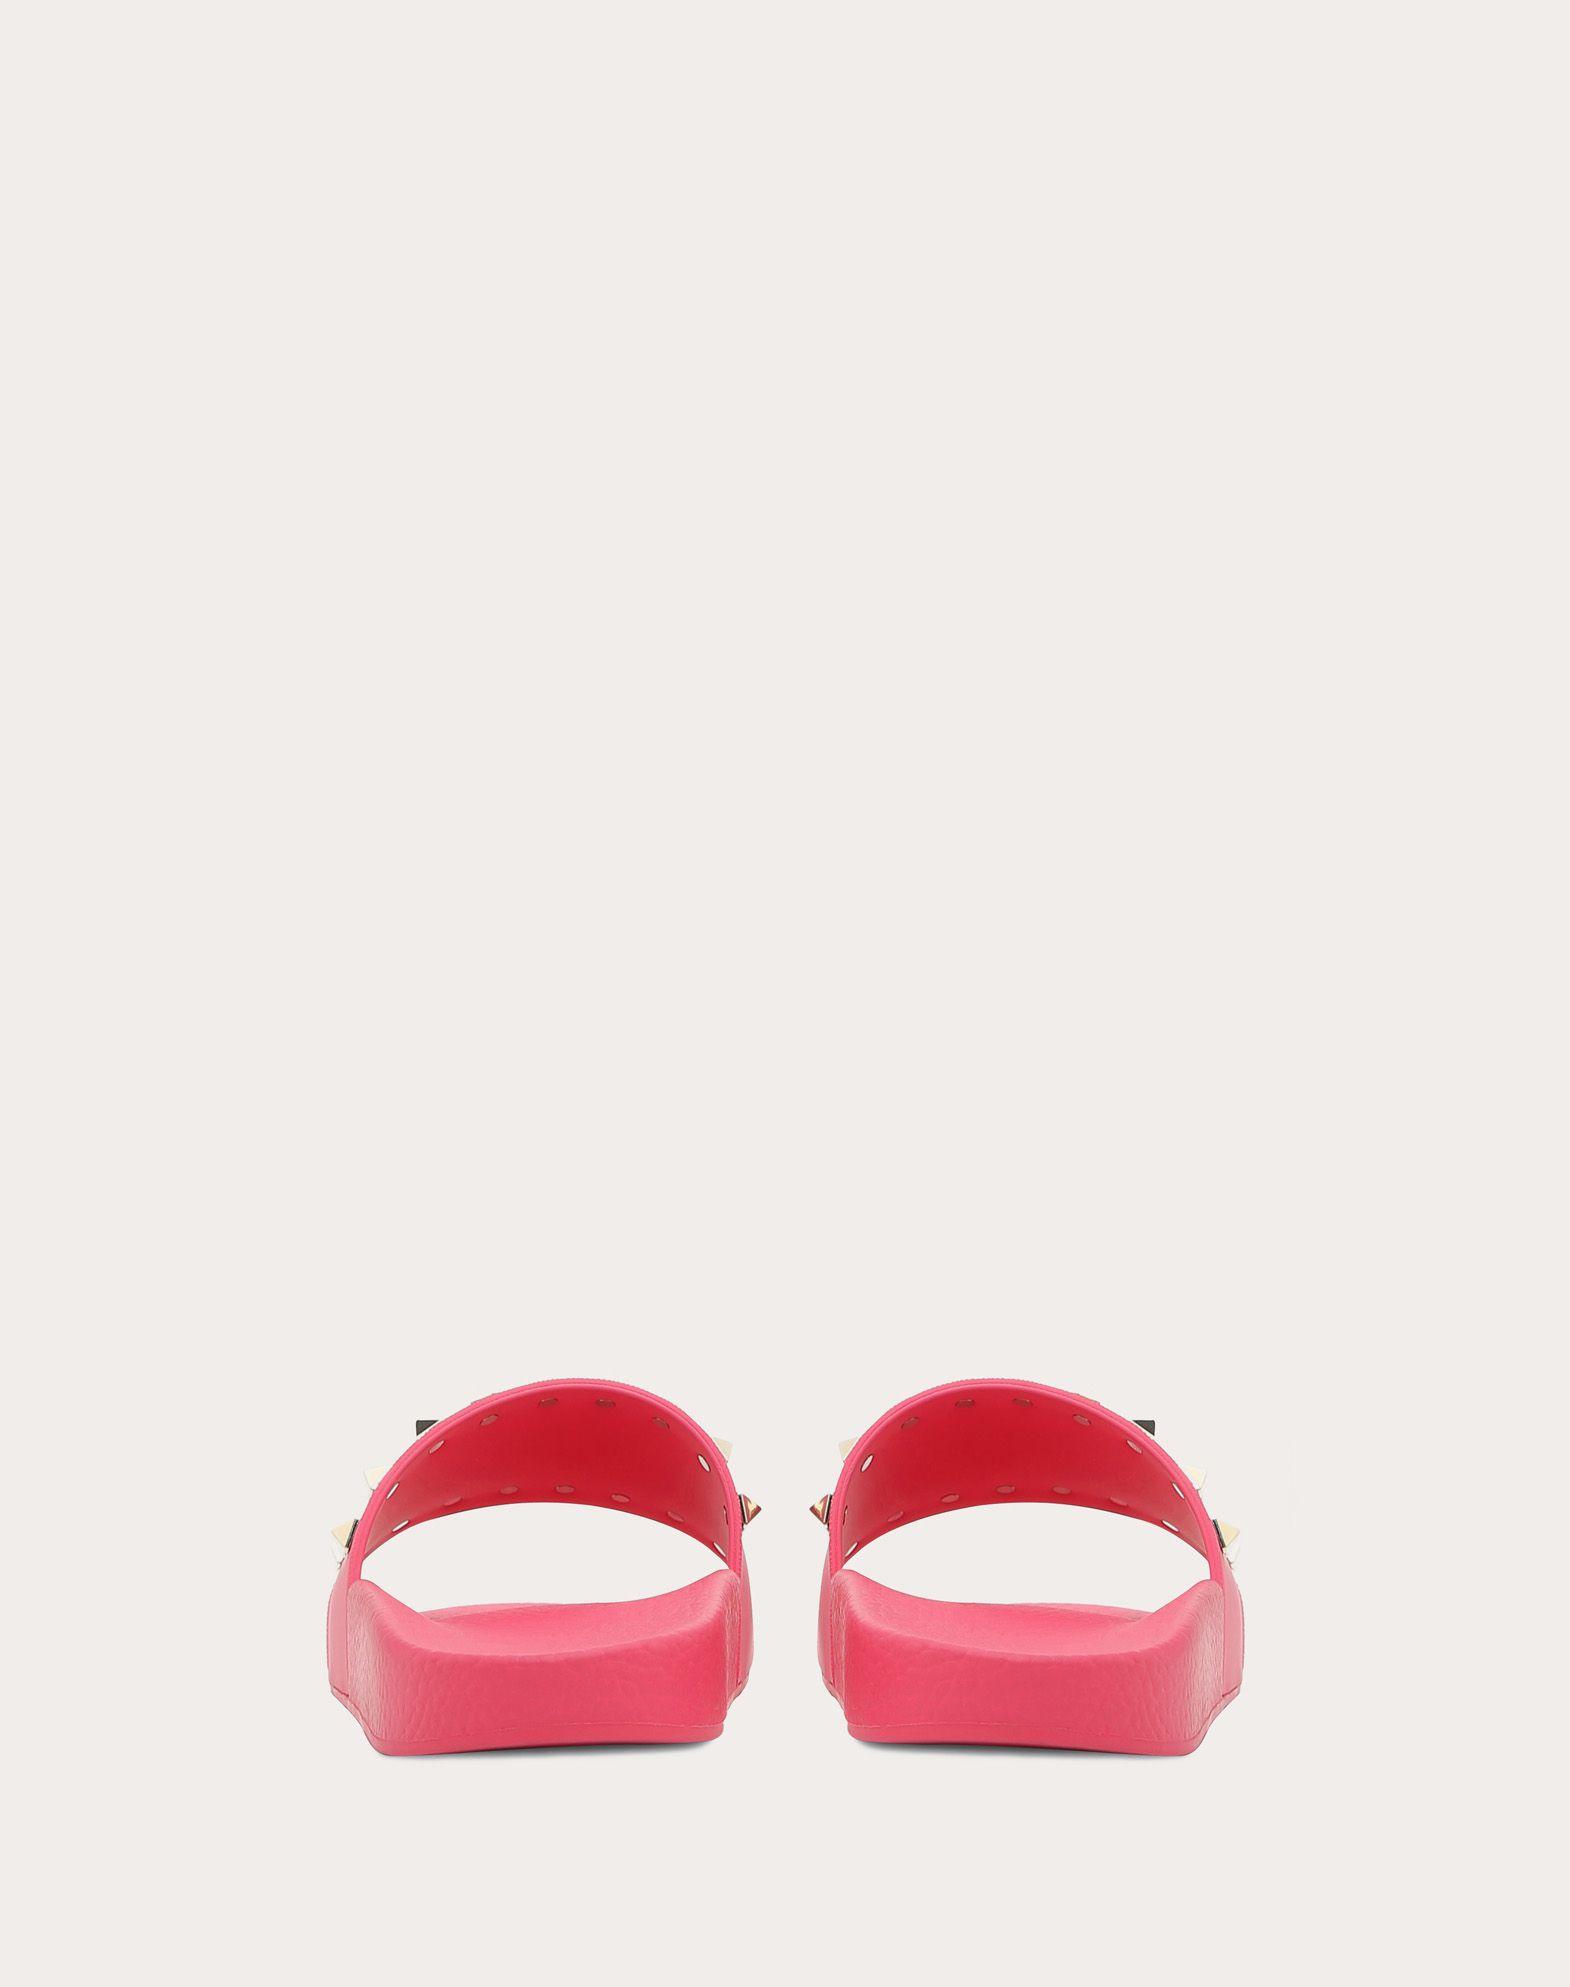 VALENTINO GARAVANI Rockstud PVC Slide Sandal SLIDE SANDAL D d